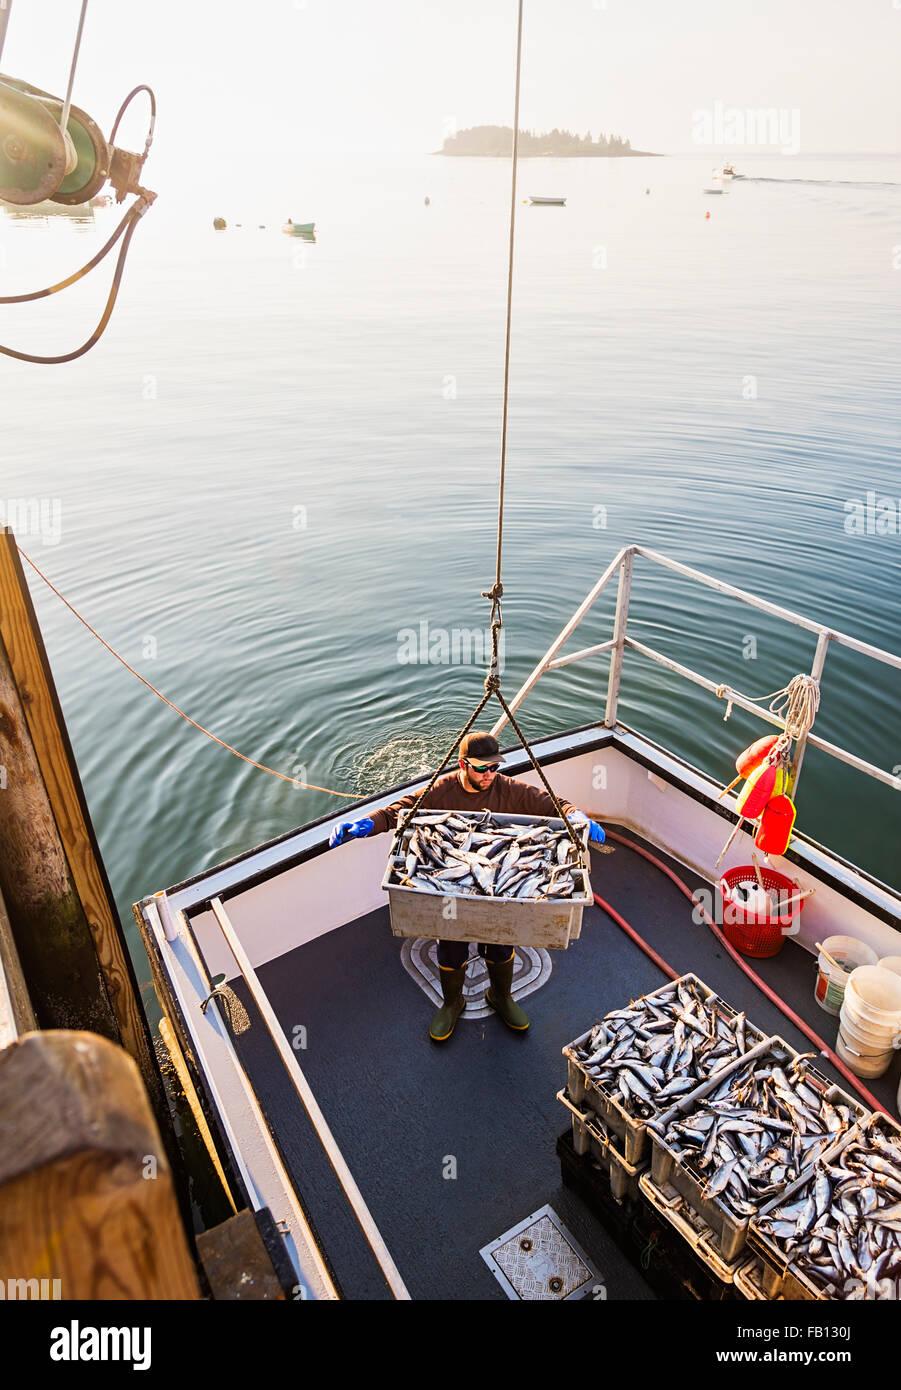 Man loading fish on boat - Stock Image